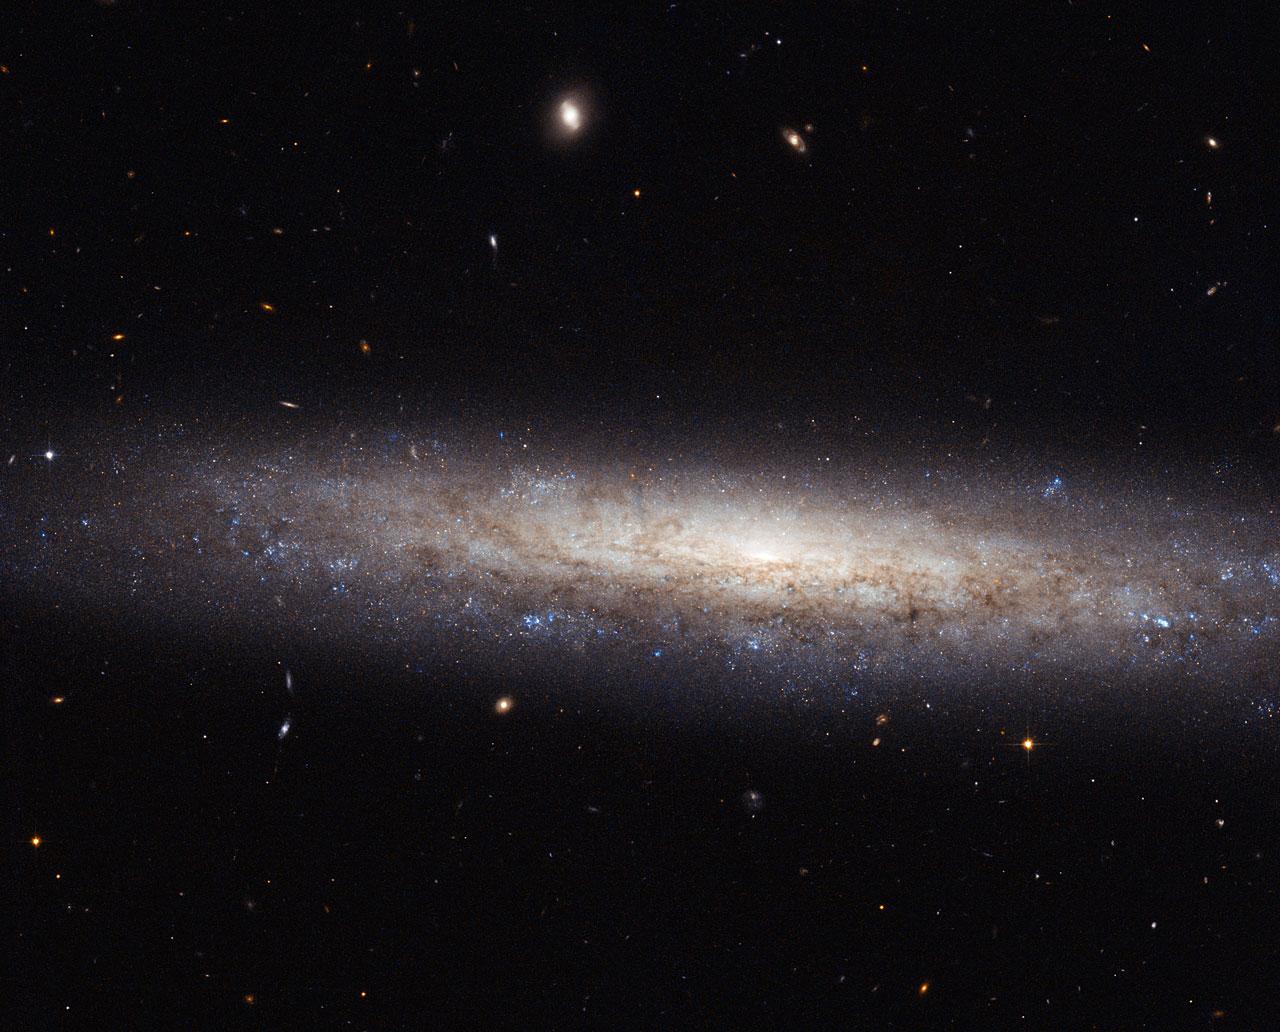 A dusty spiral in Virgo